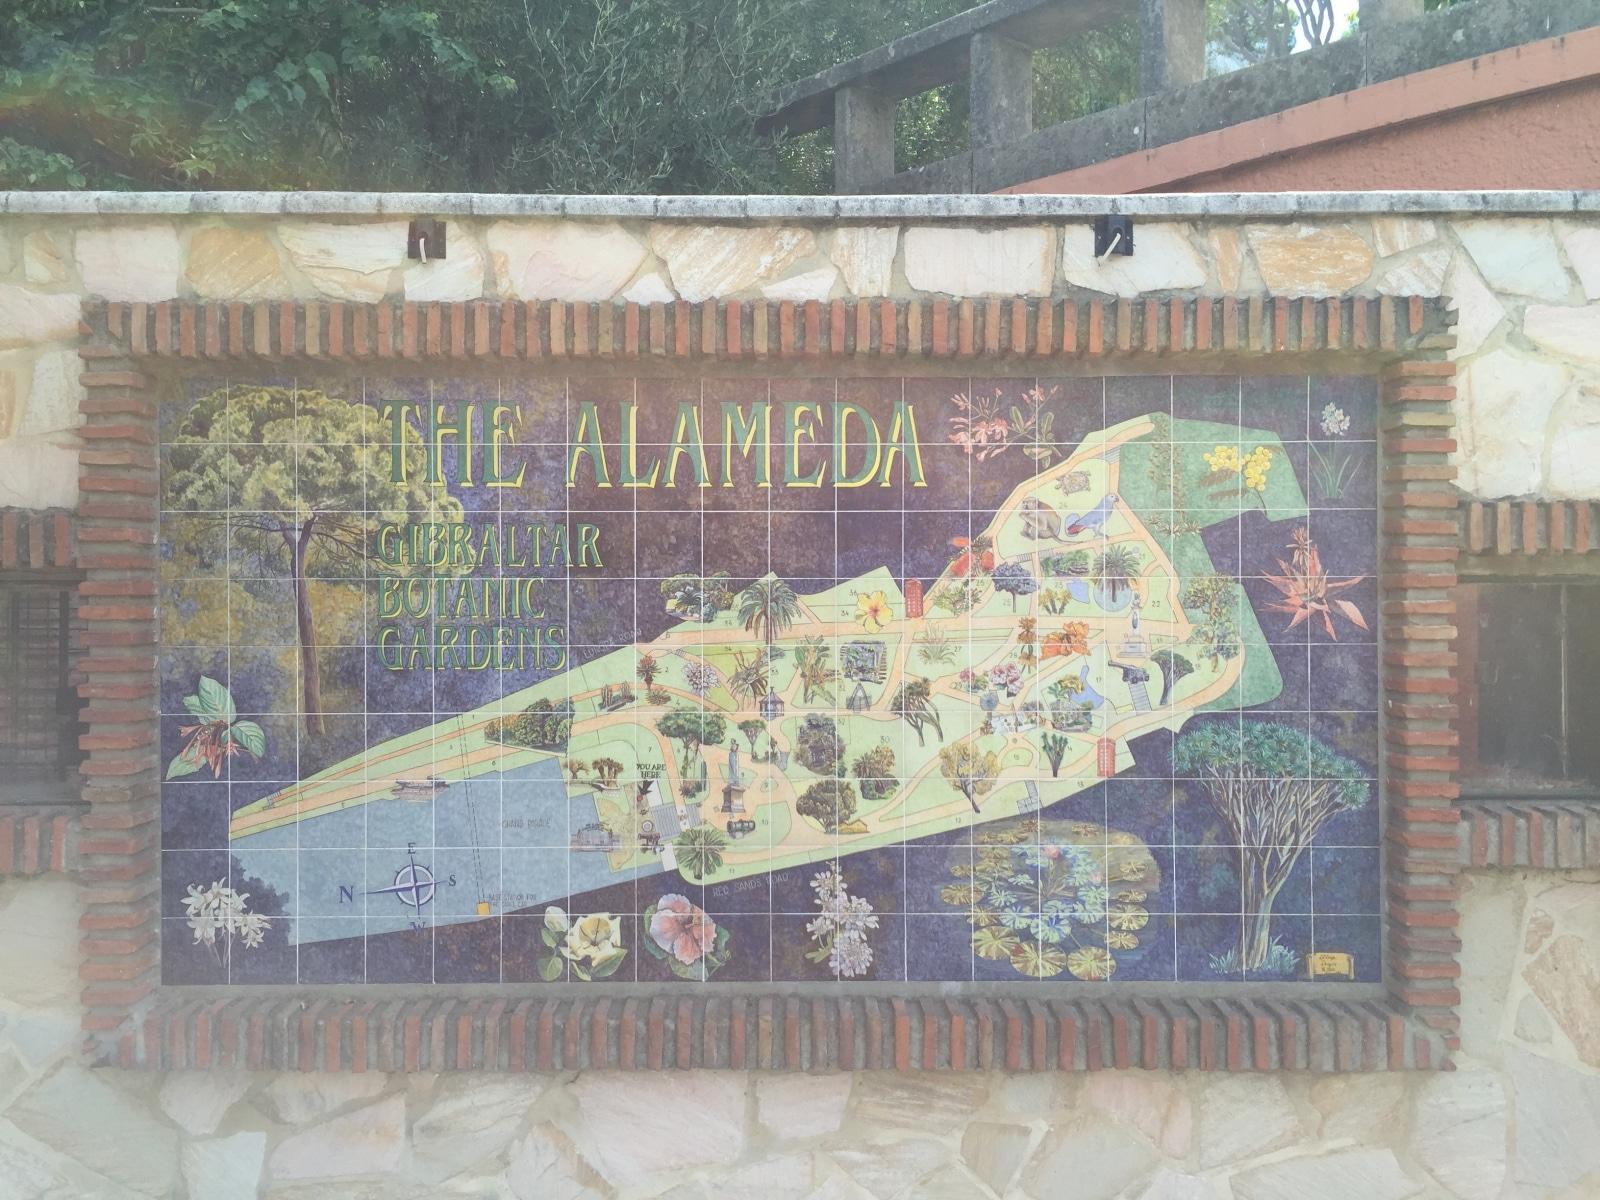 Alameda-13